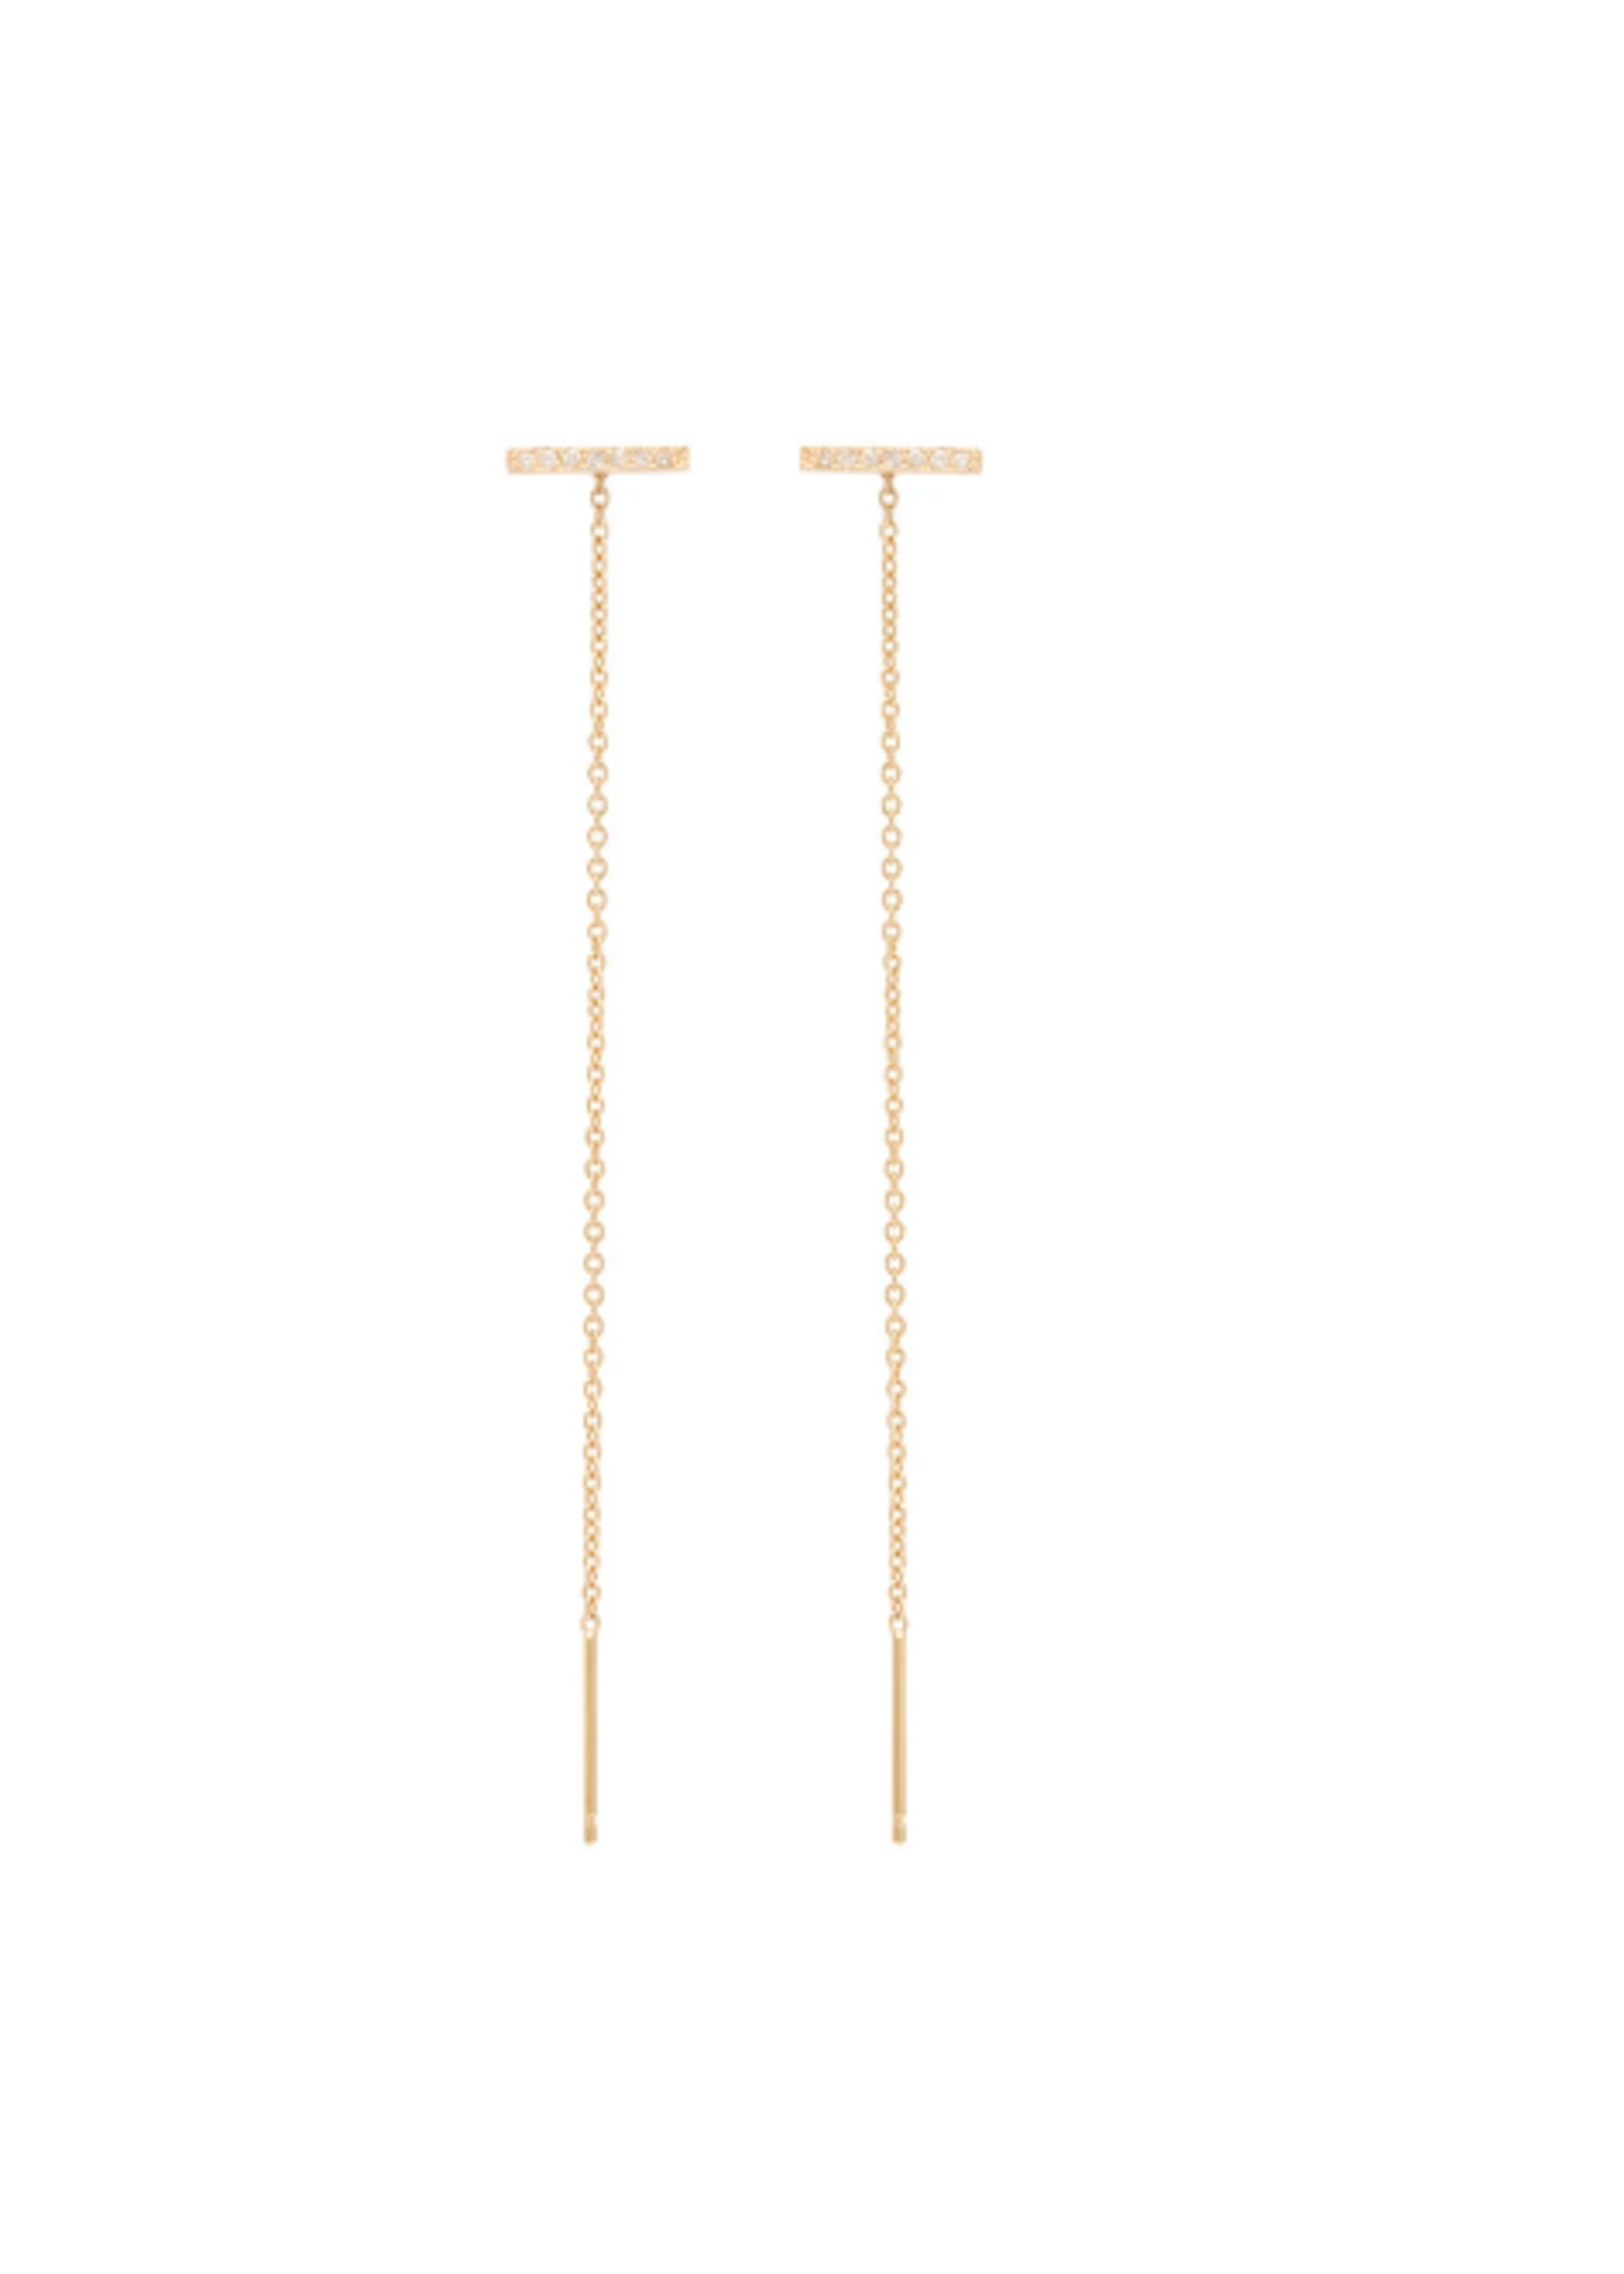 Zoe Chicco Thin Bar Stud Threader Earrings